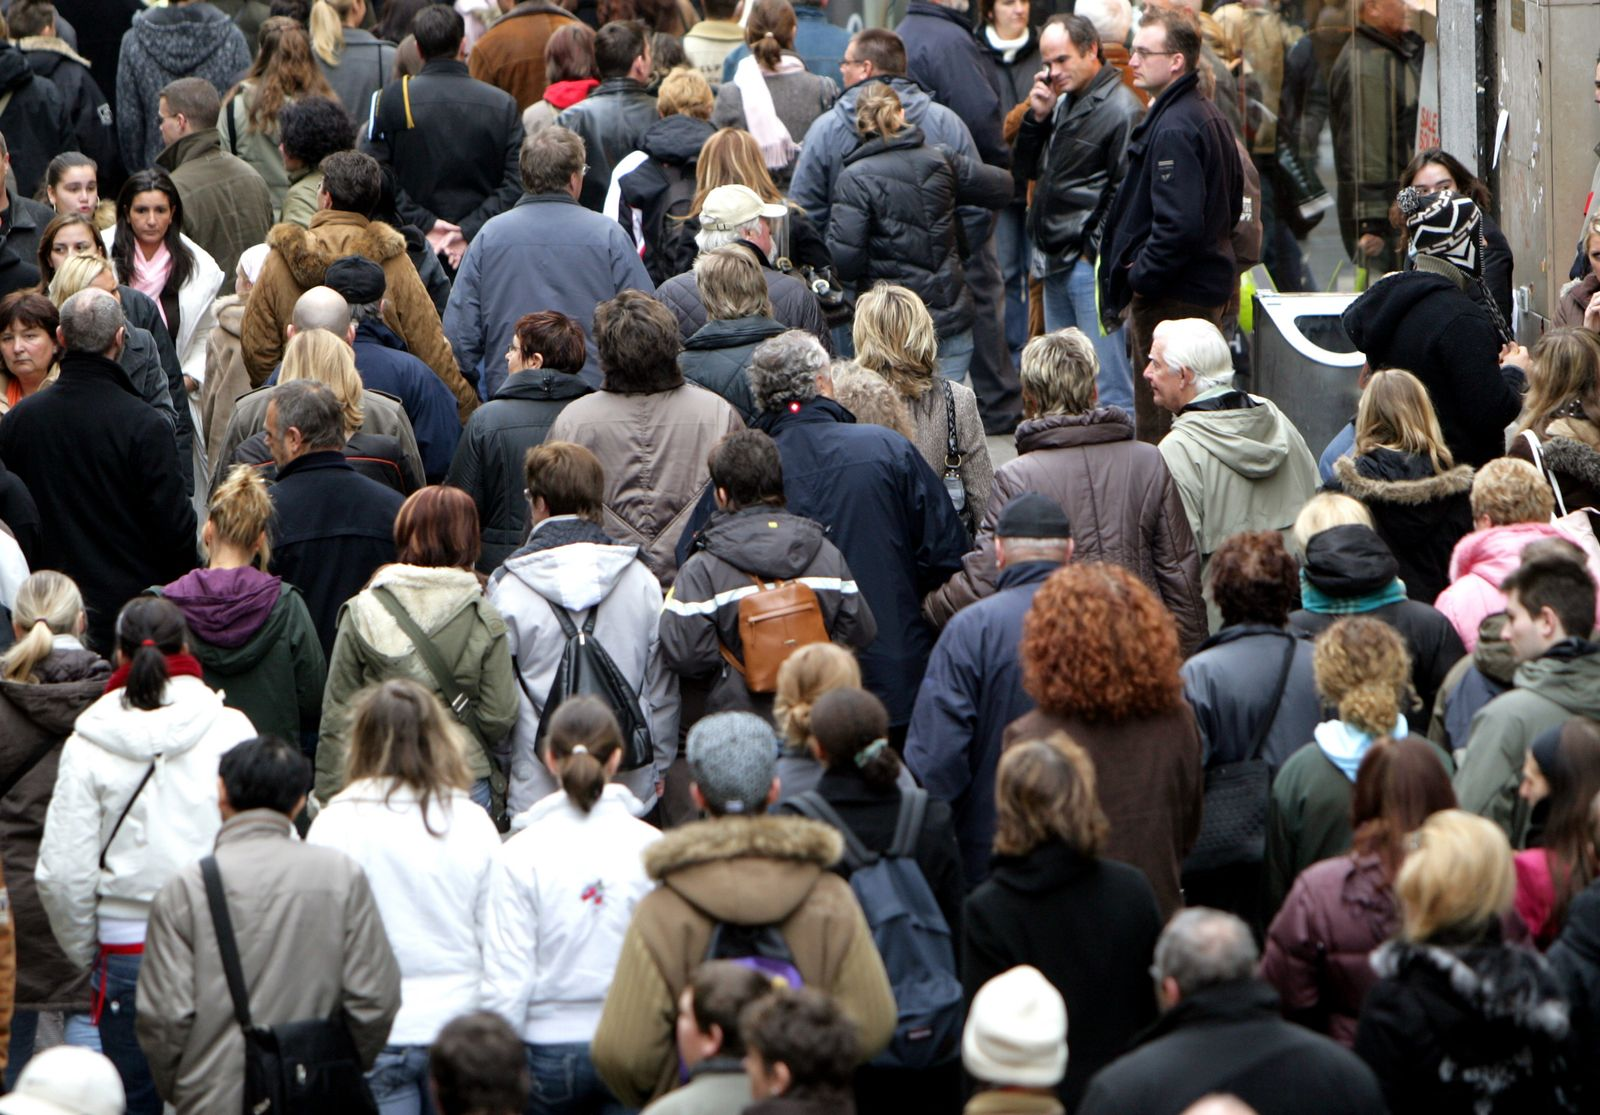 Rente/ Menschenmenge